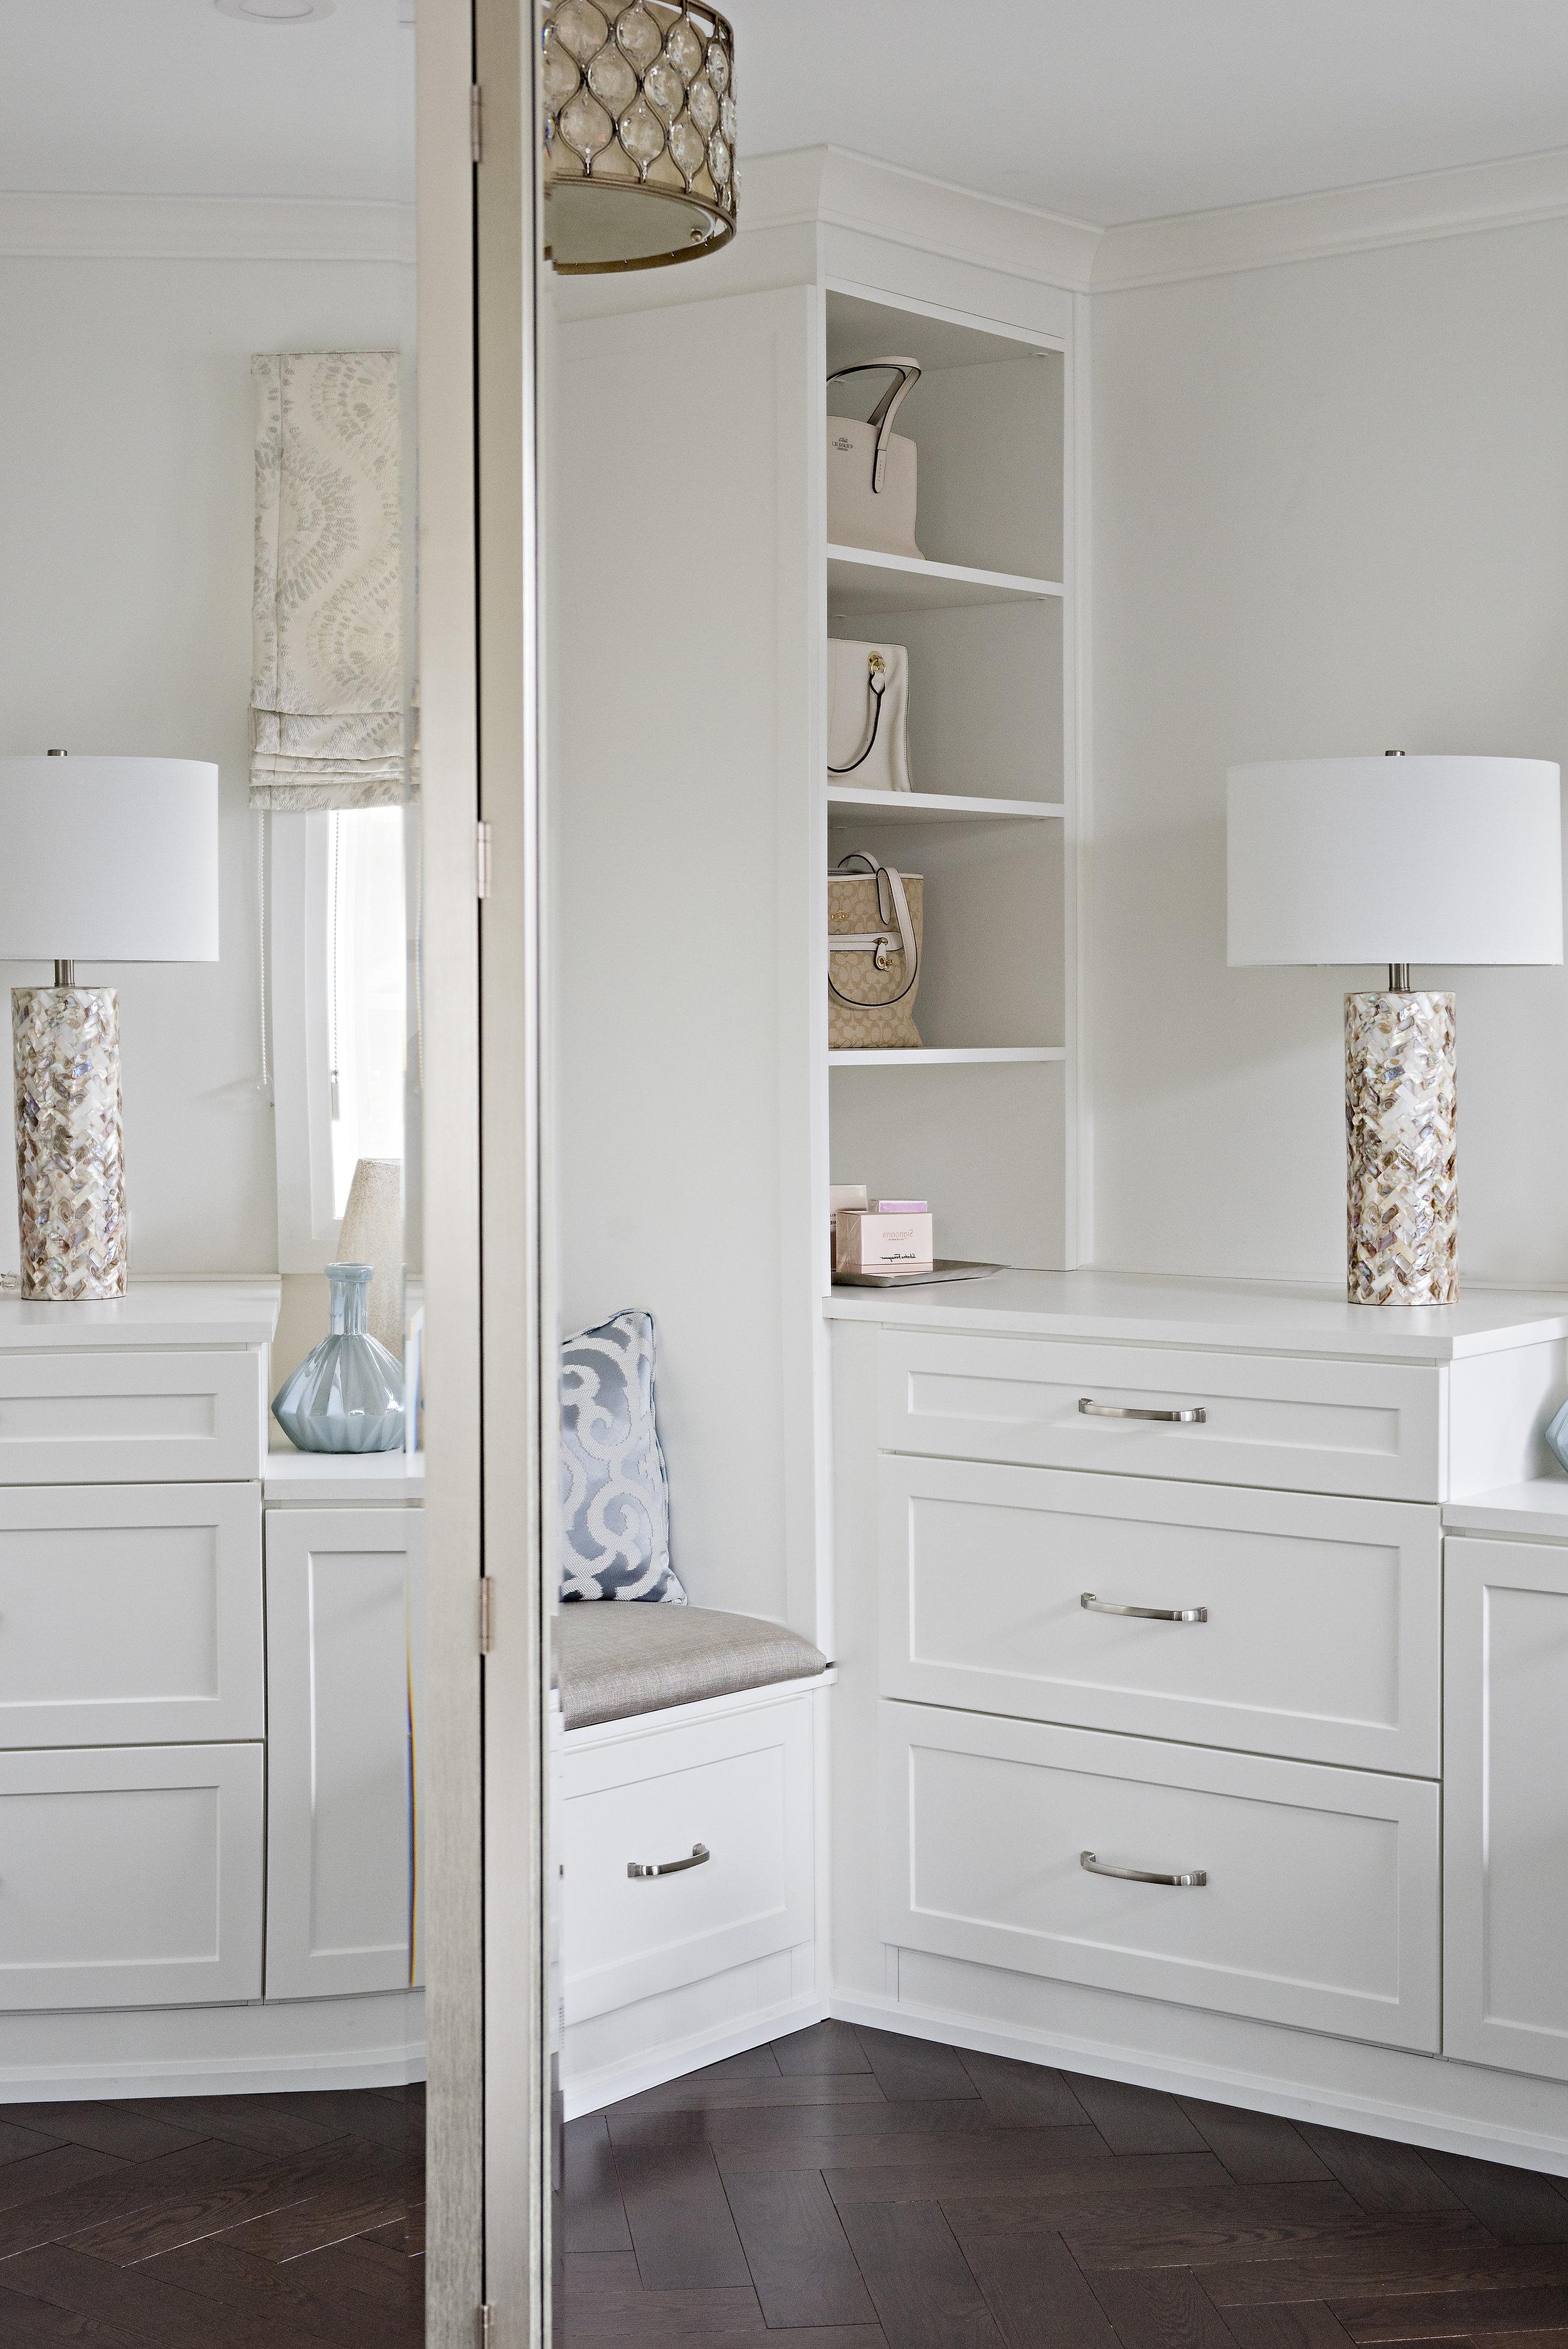 pizzale design interior design bedroom walk in closet white shaker cabinets open display storage dark hardwood herringbone flooring .jpg